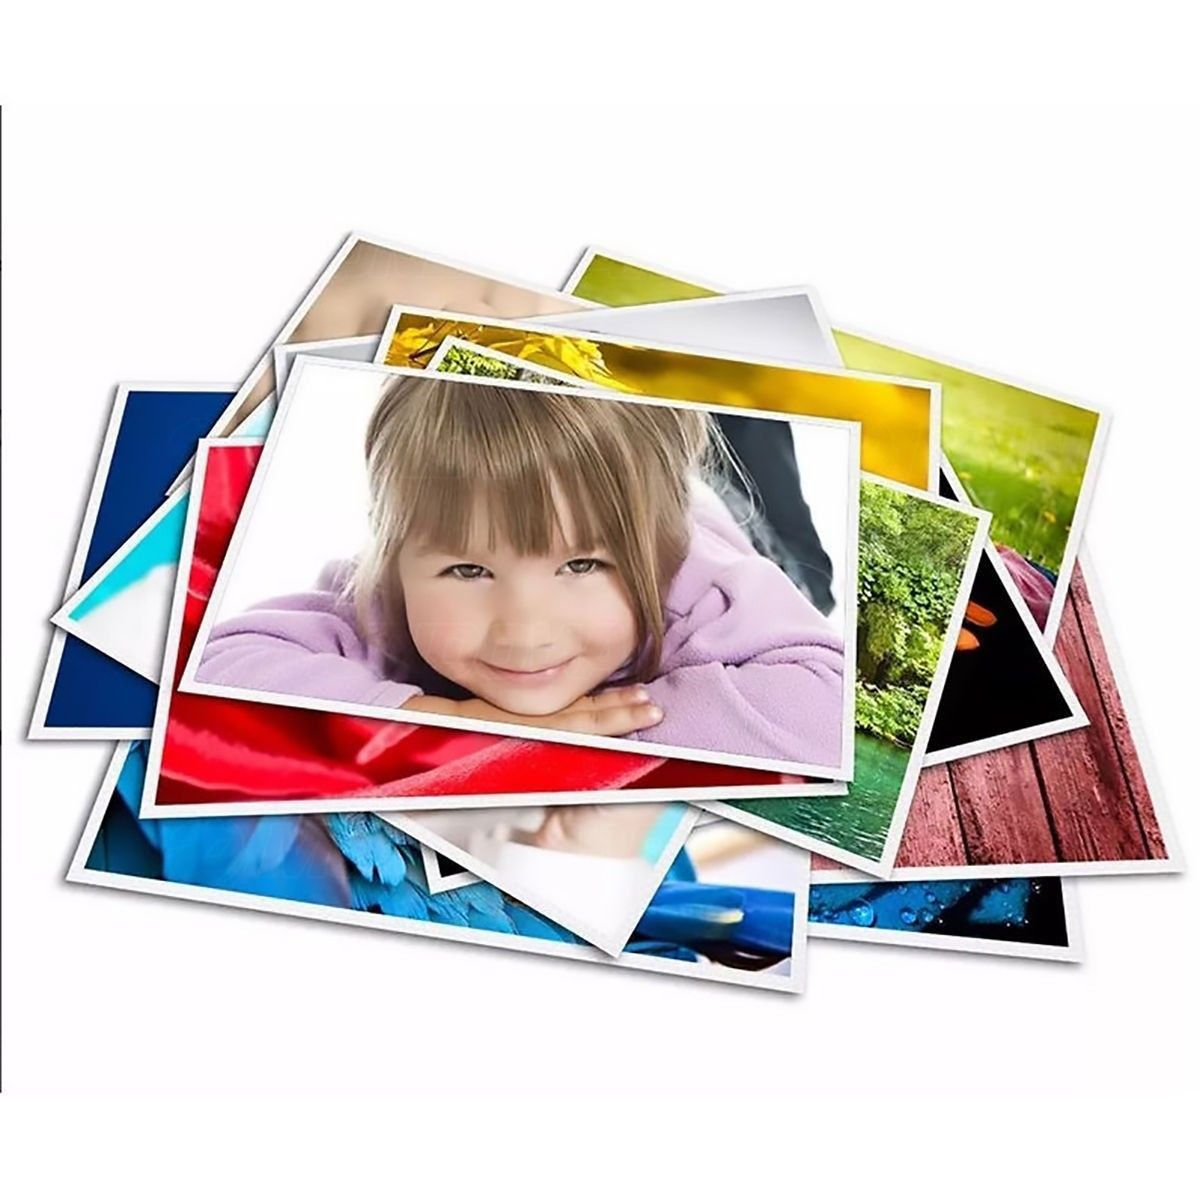 Papel Fotográfico 180g A4- 20 Folhas